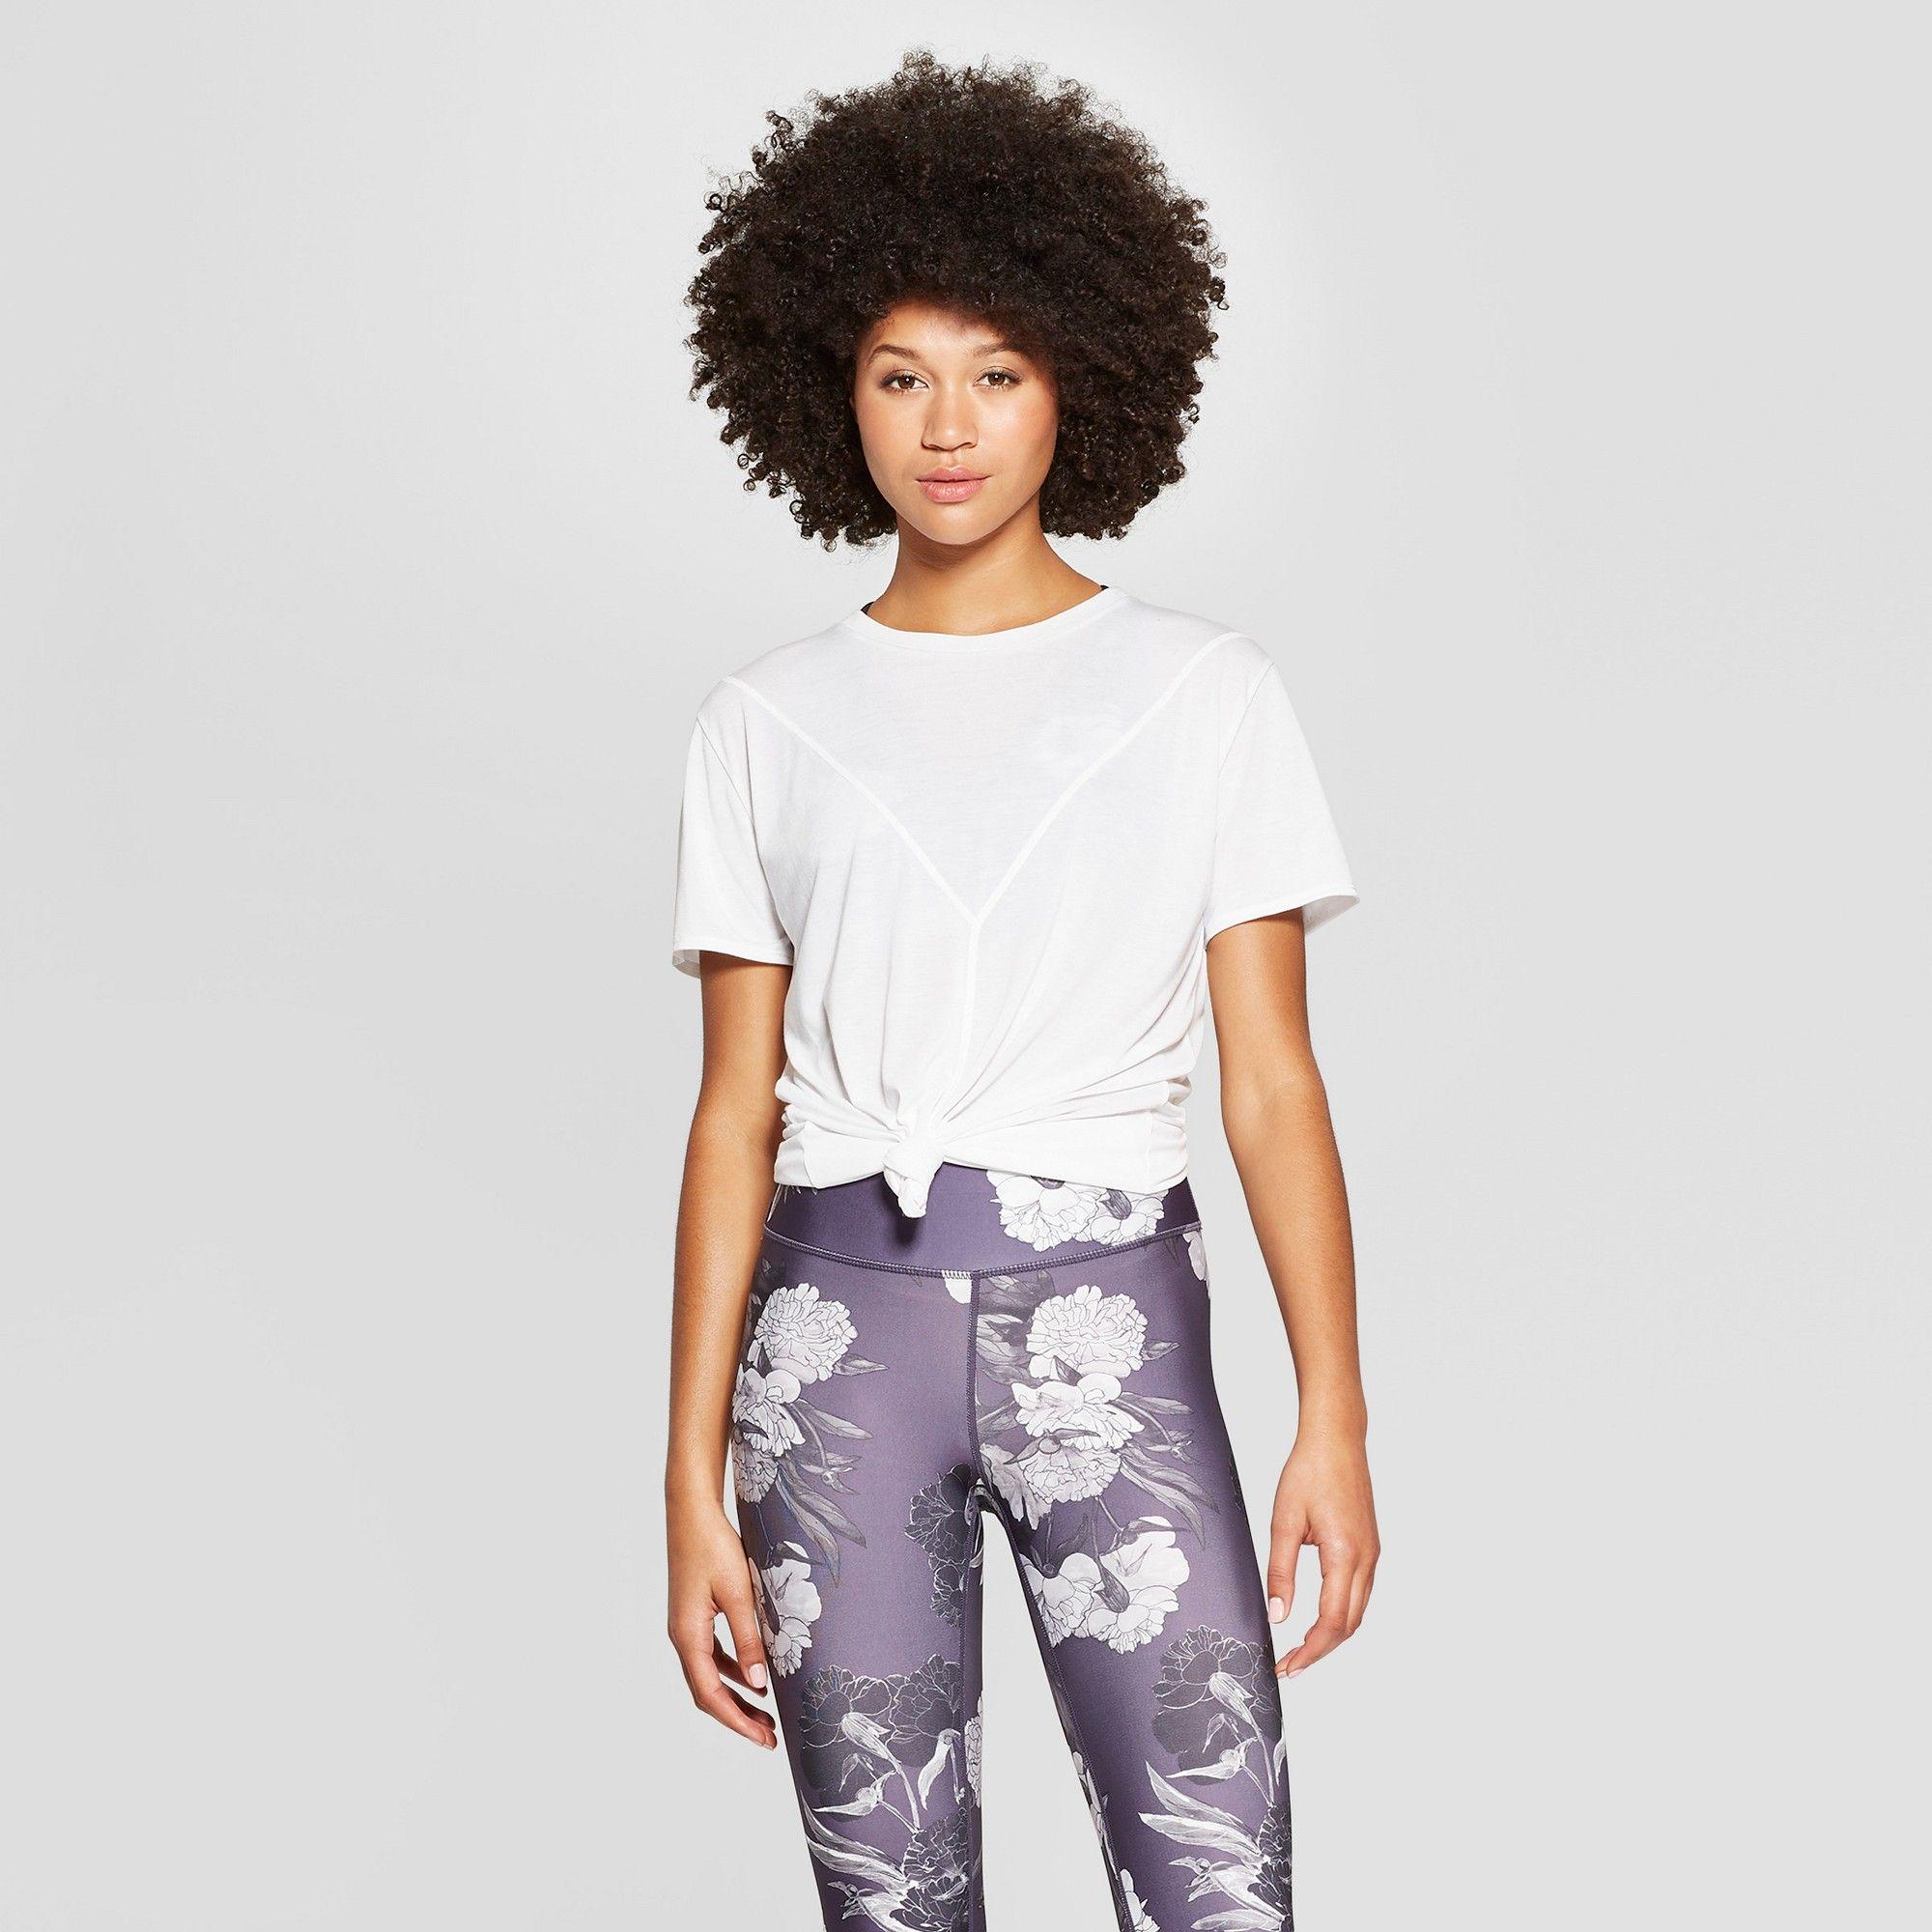 49acd697 Women's Mesh Back T-Shirt - JoyLab White Xxl in 2019   Products ...